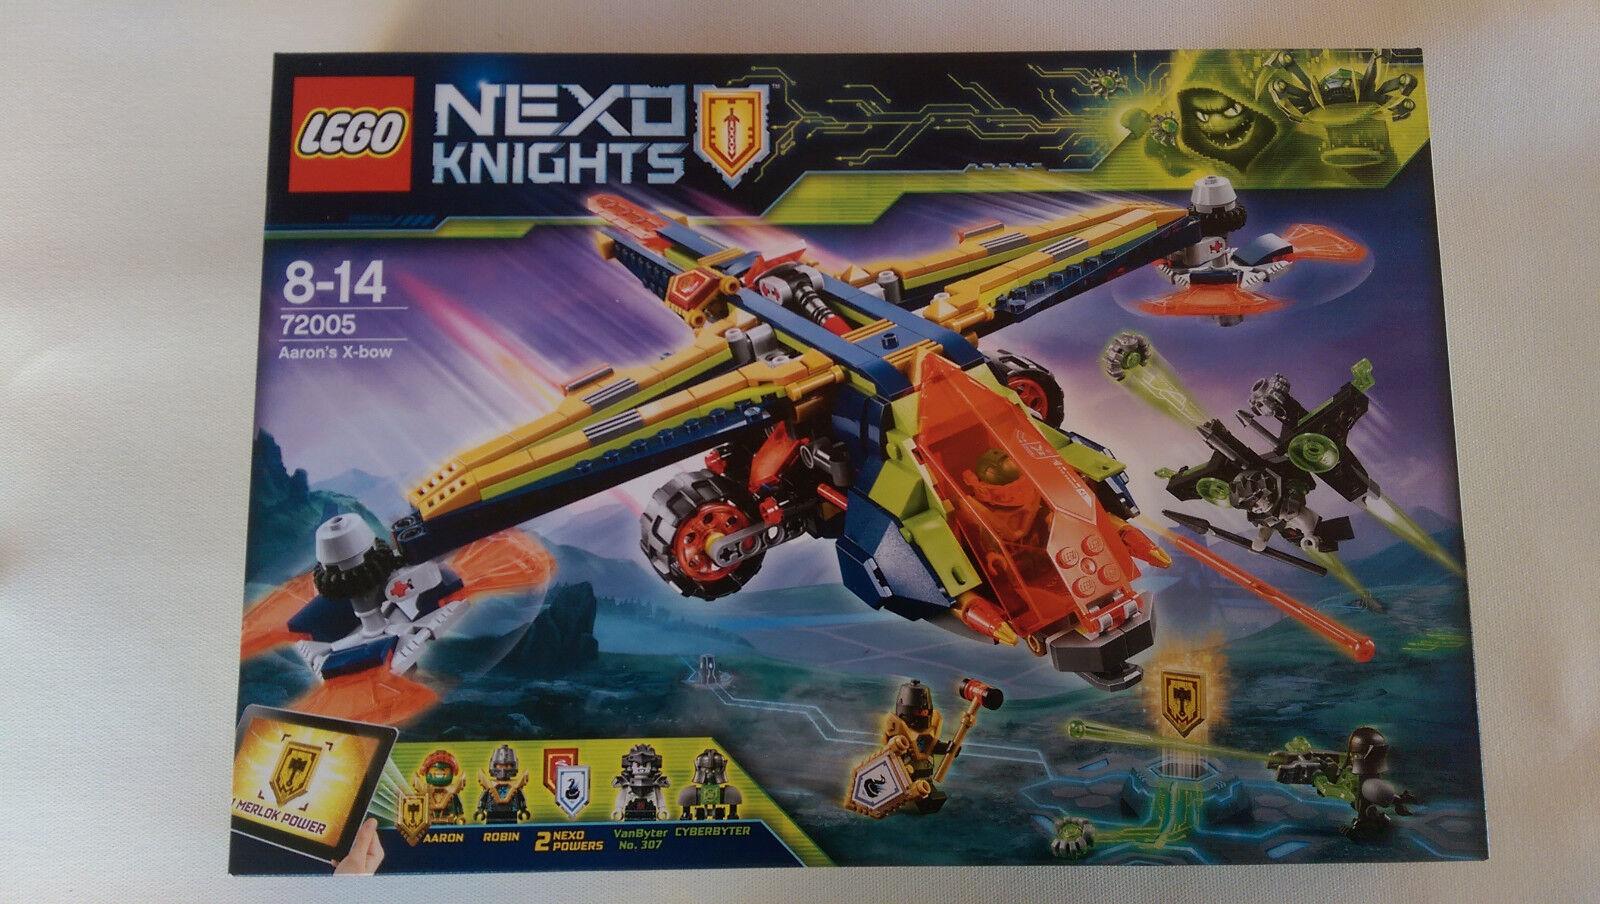 Lego Nexo Knights - 72005 - L'avion-arbalète d'Aaron - Boite neuve et Scellée